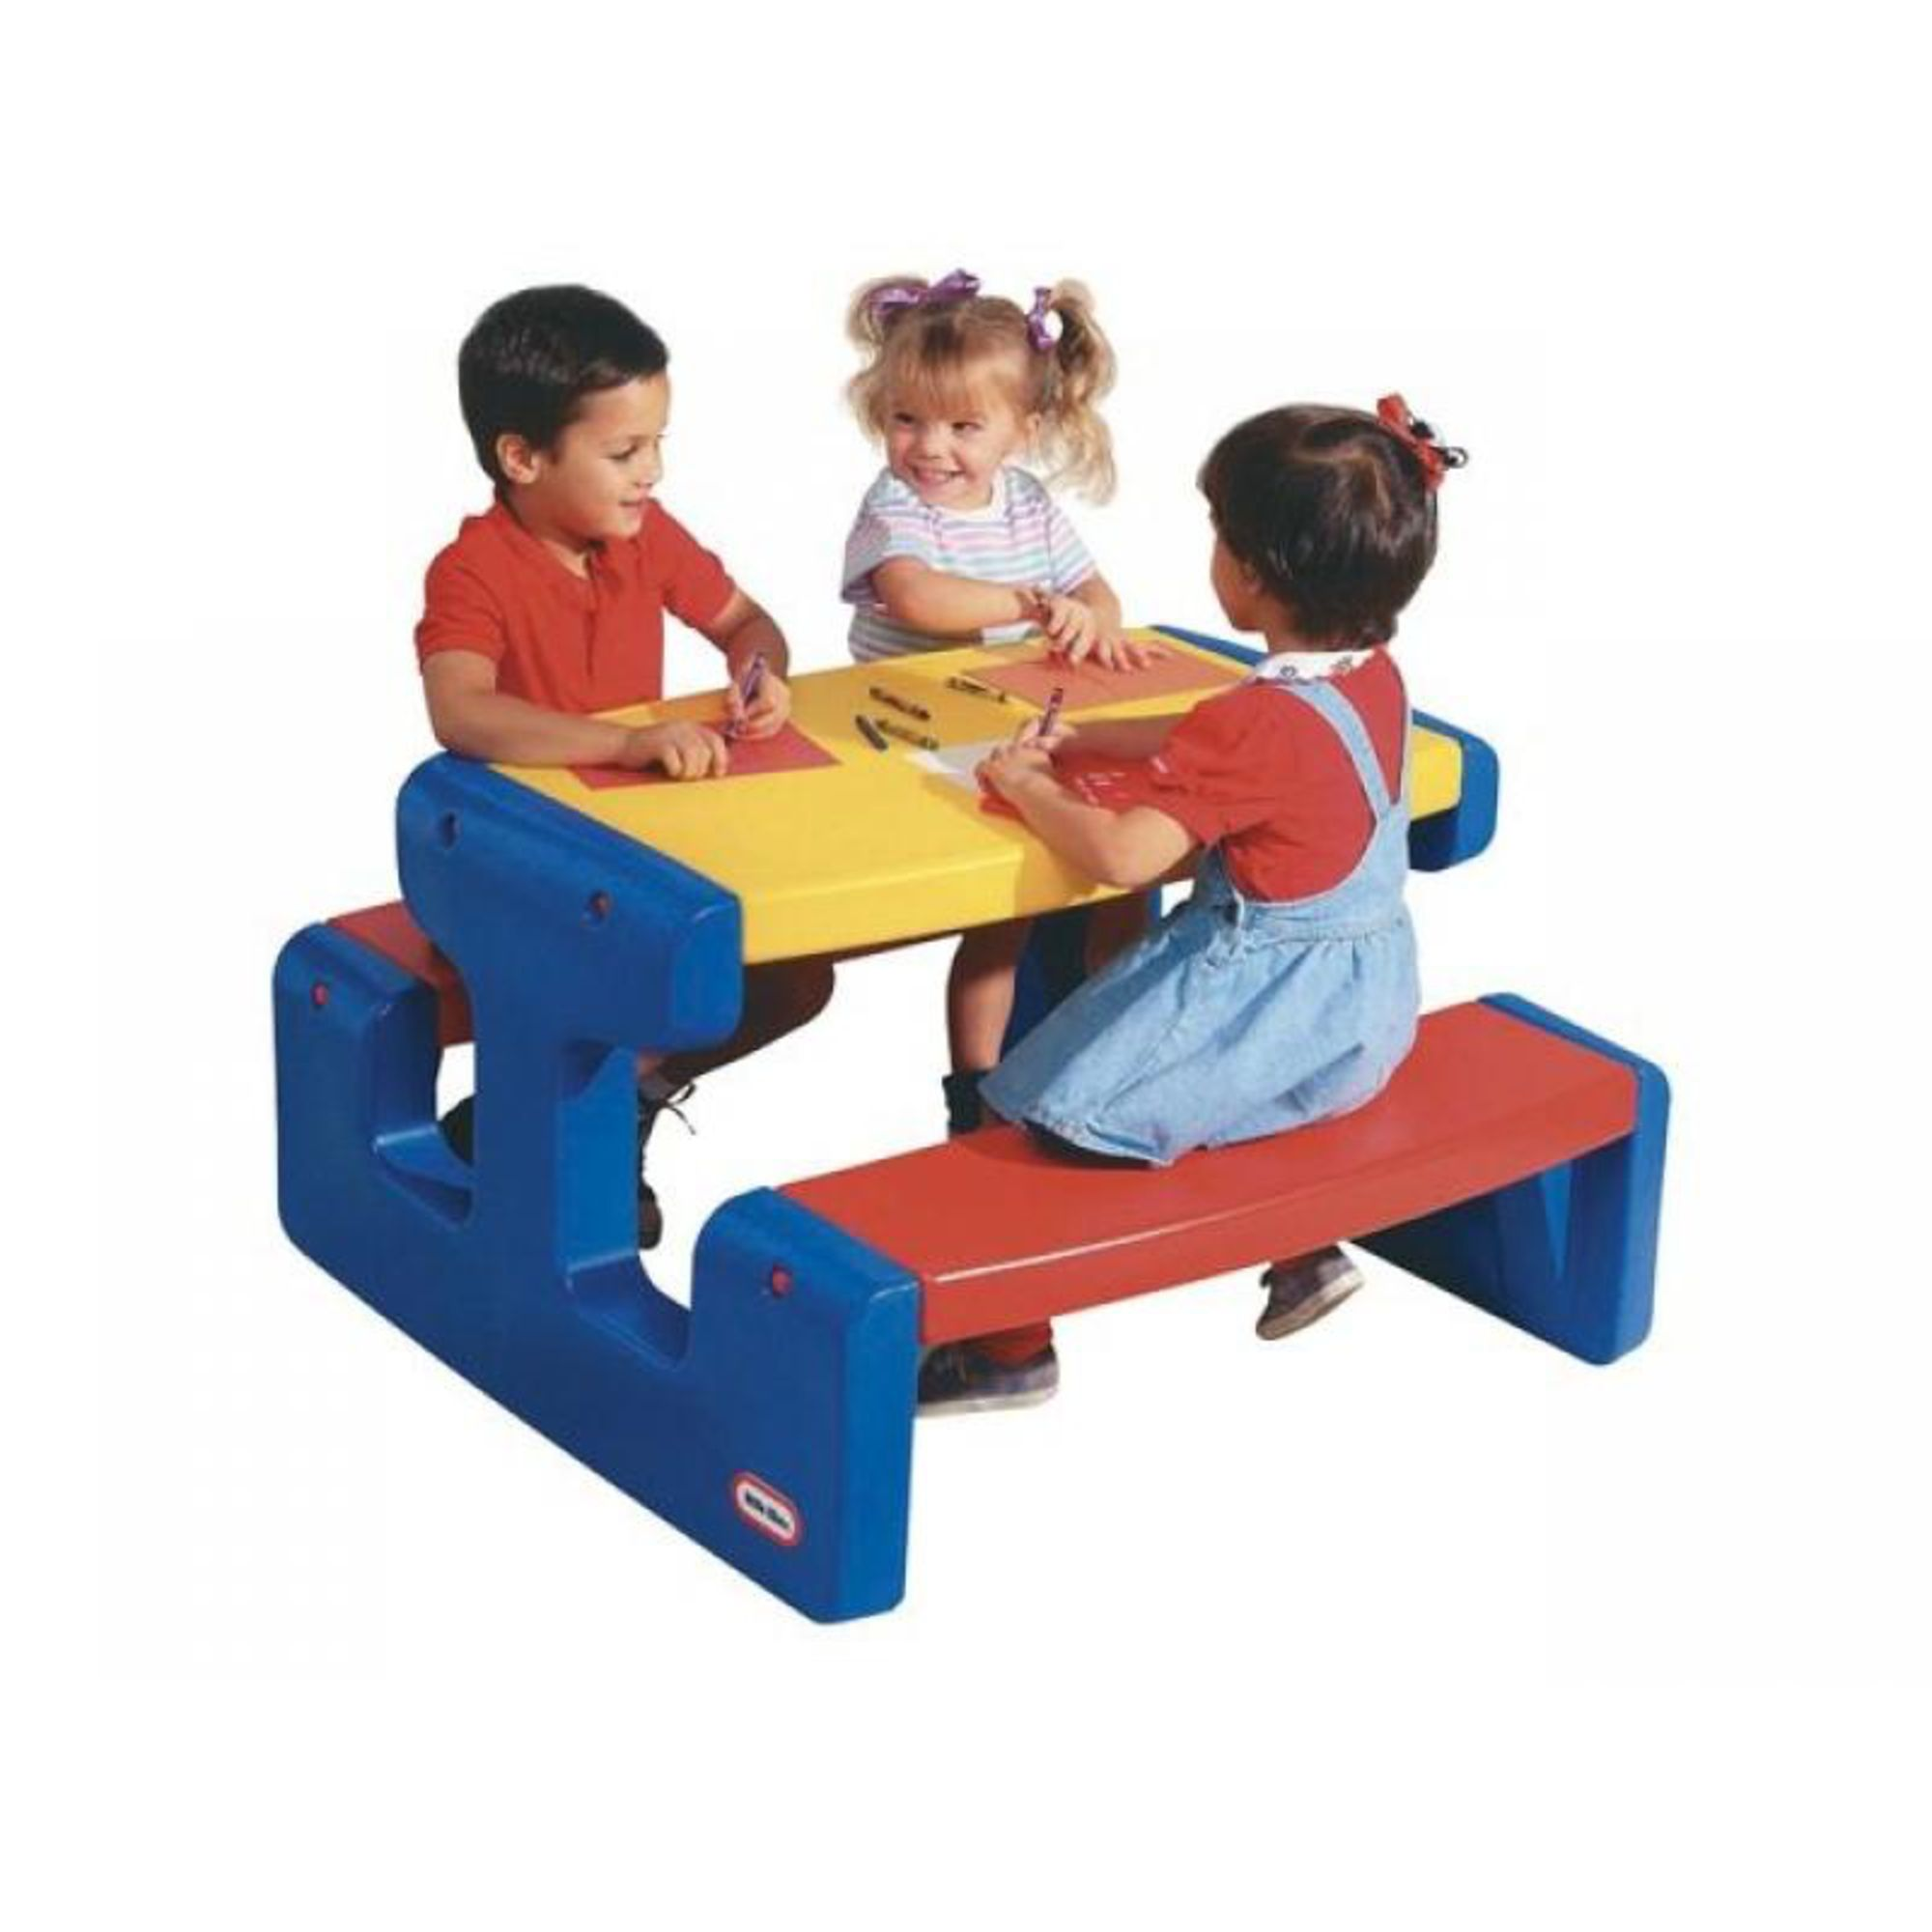 Little Tikes Piknikbord Primary